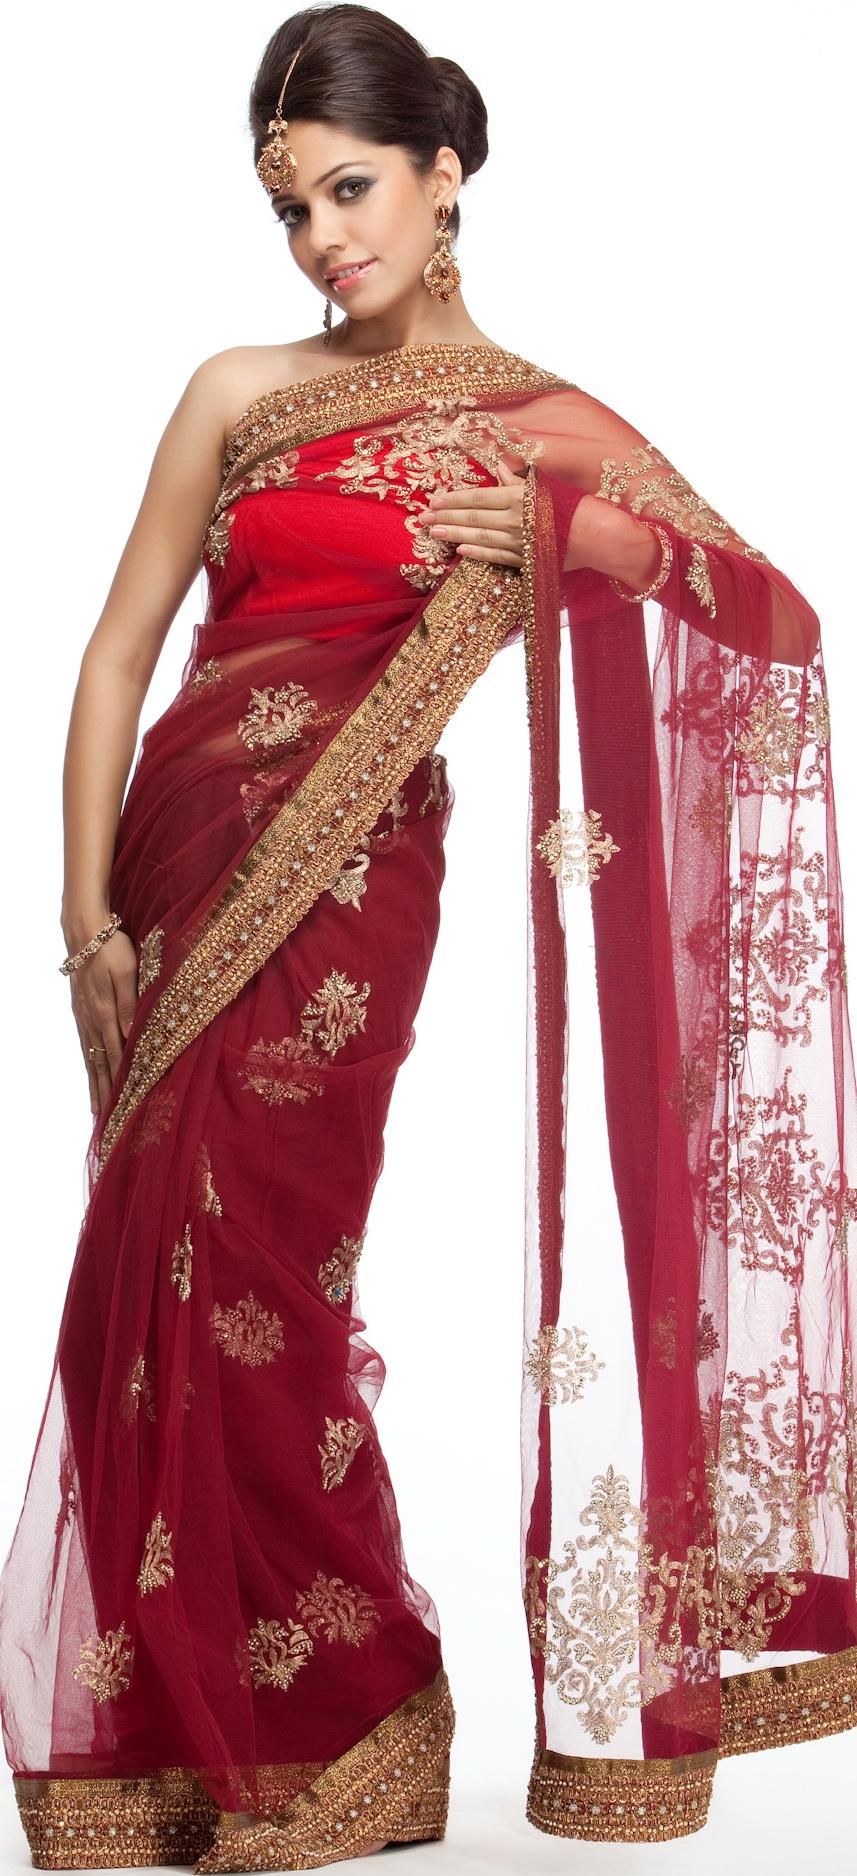 Salwar kameez sale in bangalore dating 8